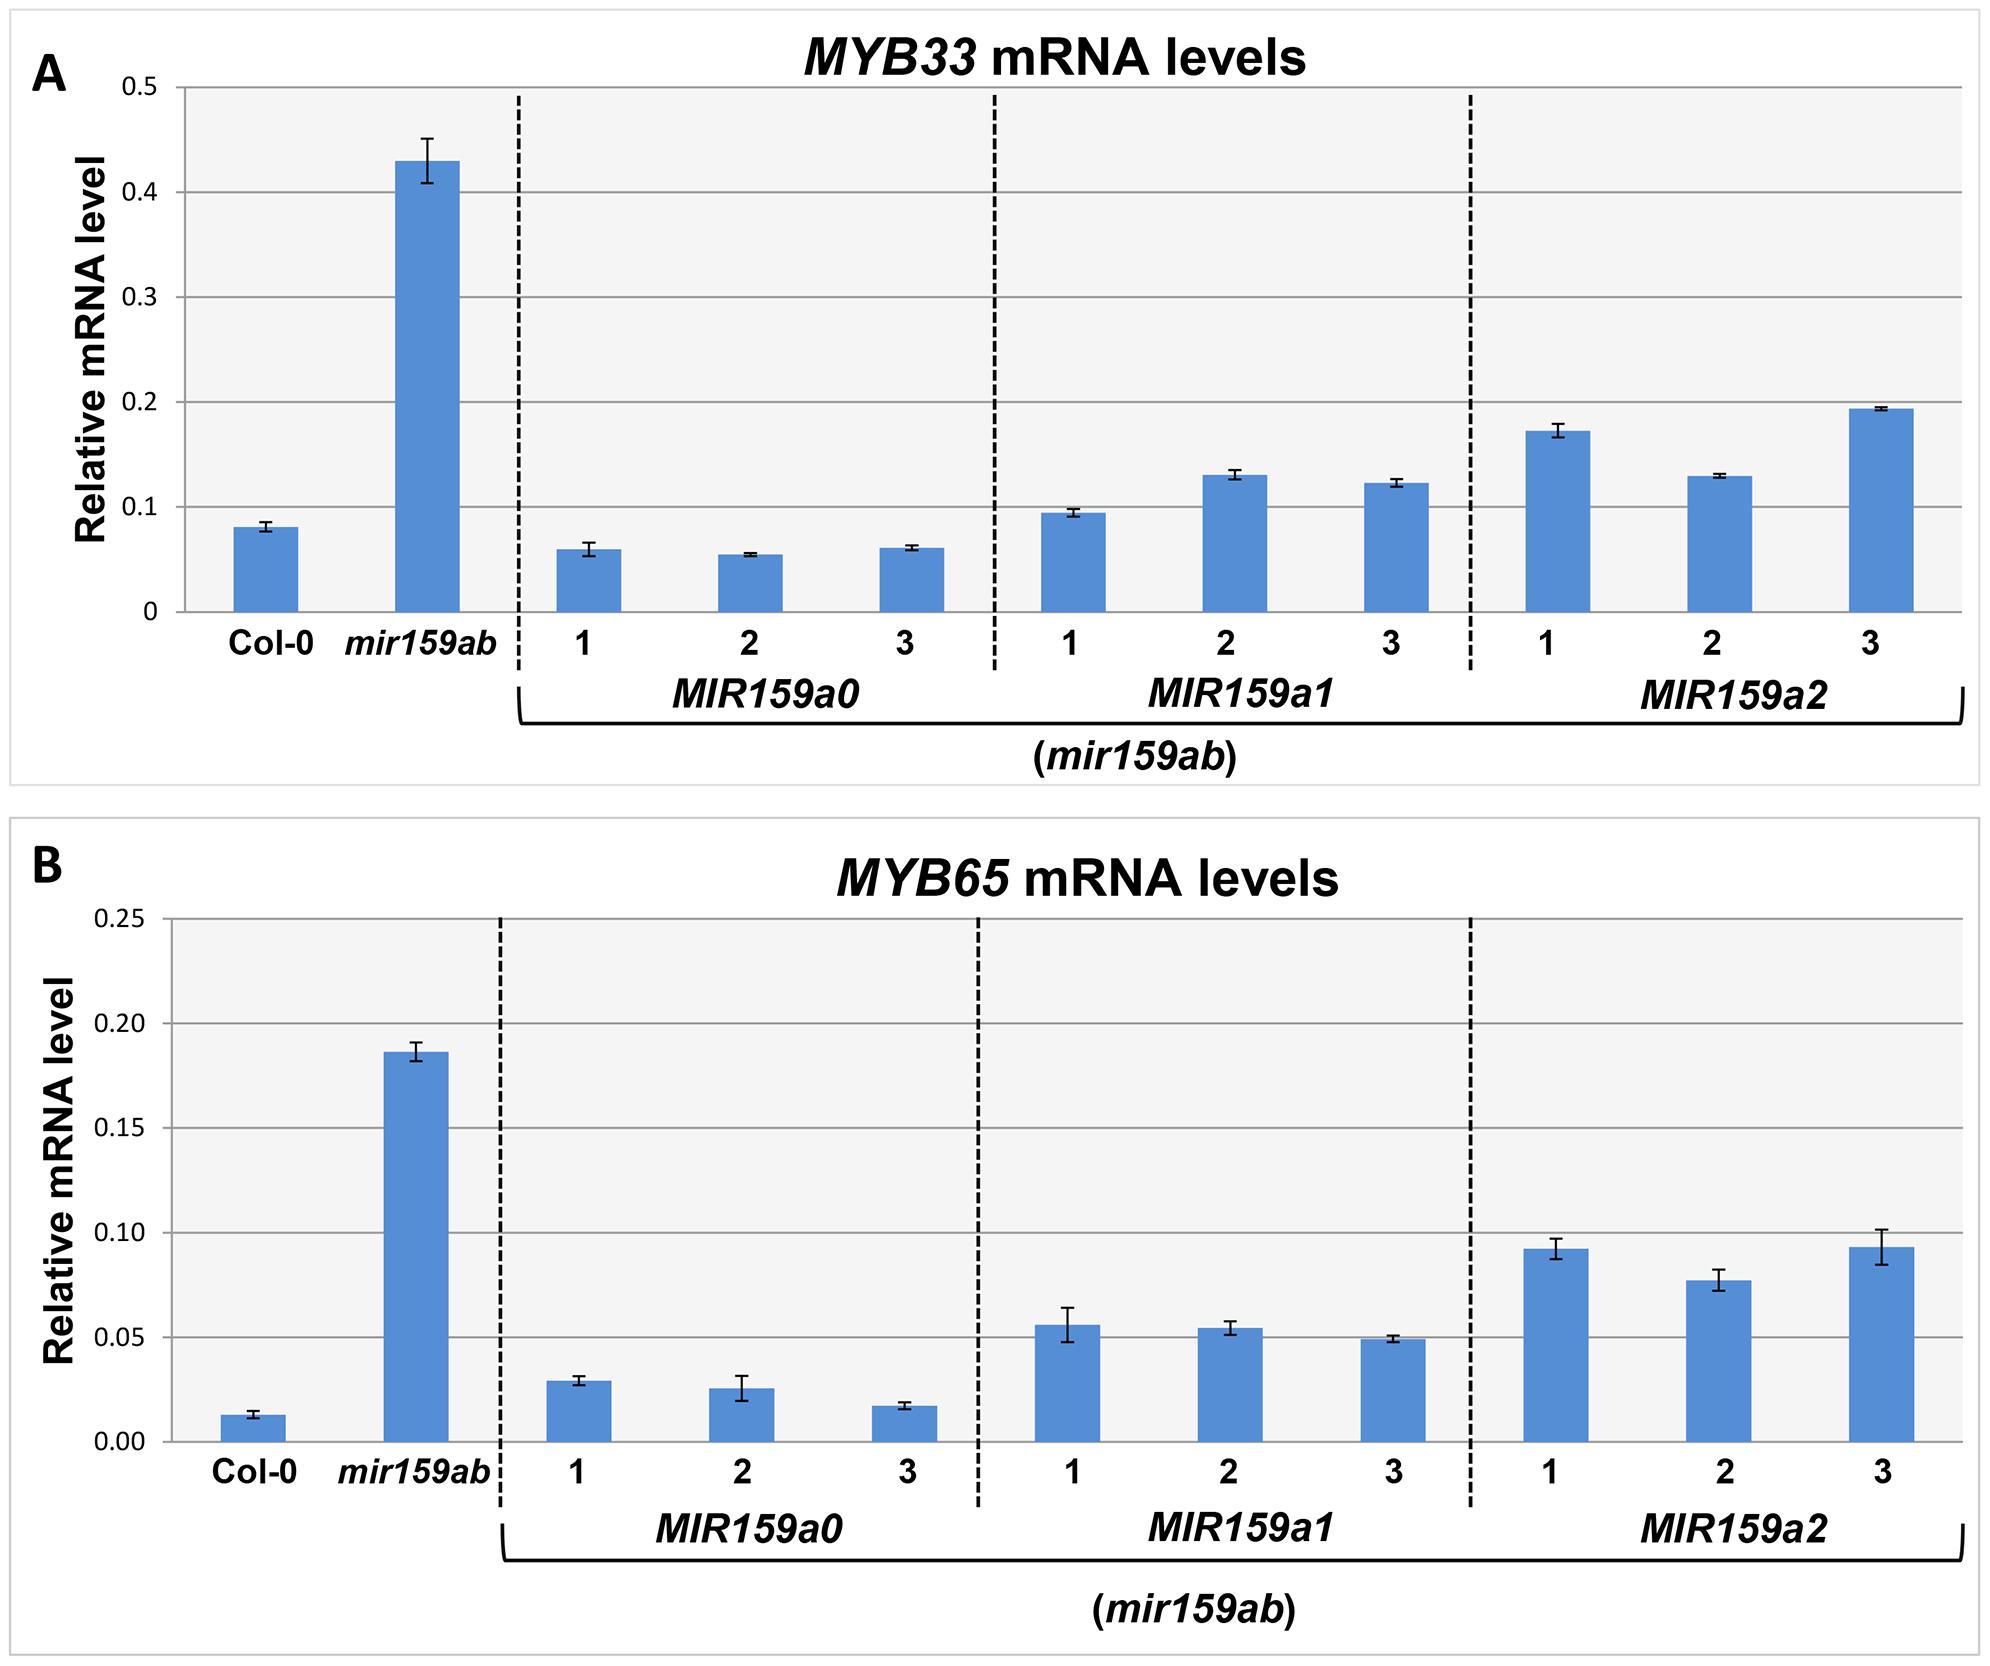 MiR159a1 and miR159a2 repress the endogenous <i>MYB33/MYB65</i> mRNA levels.